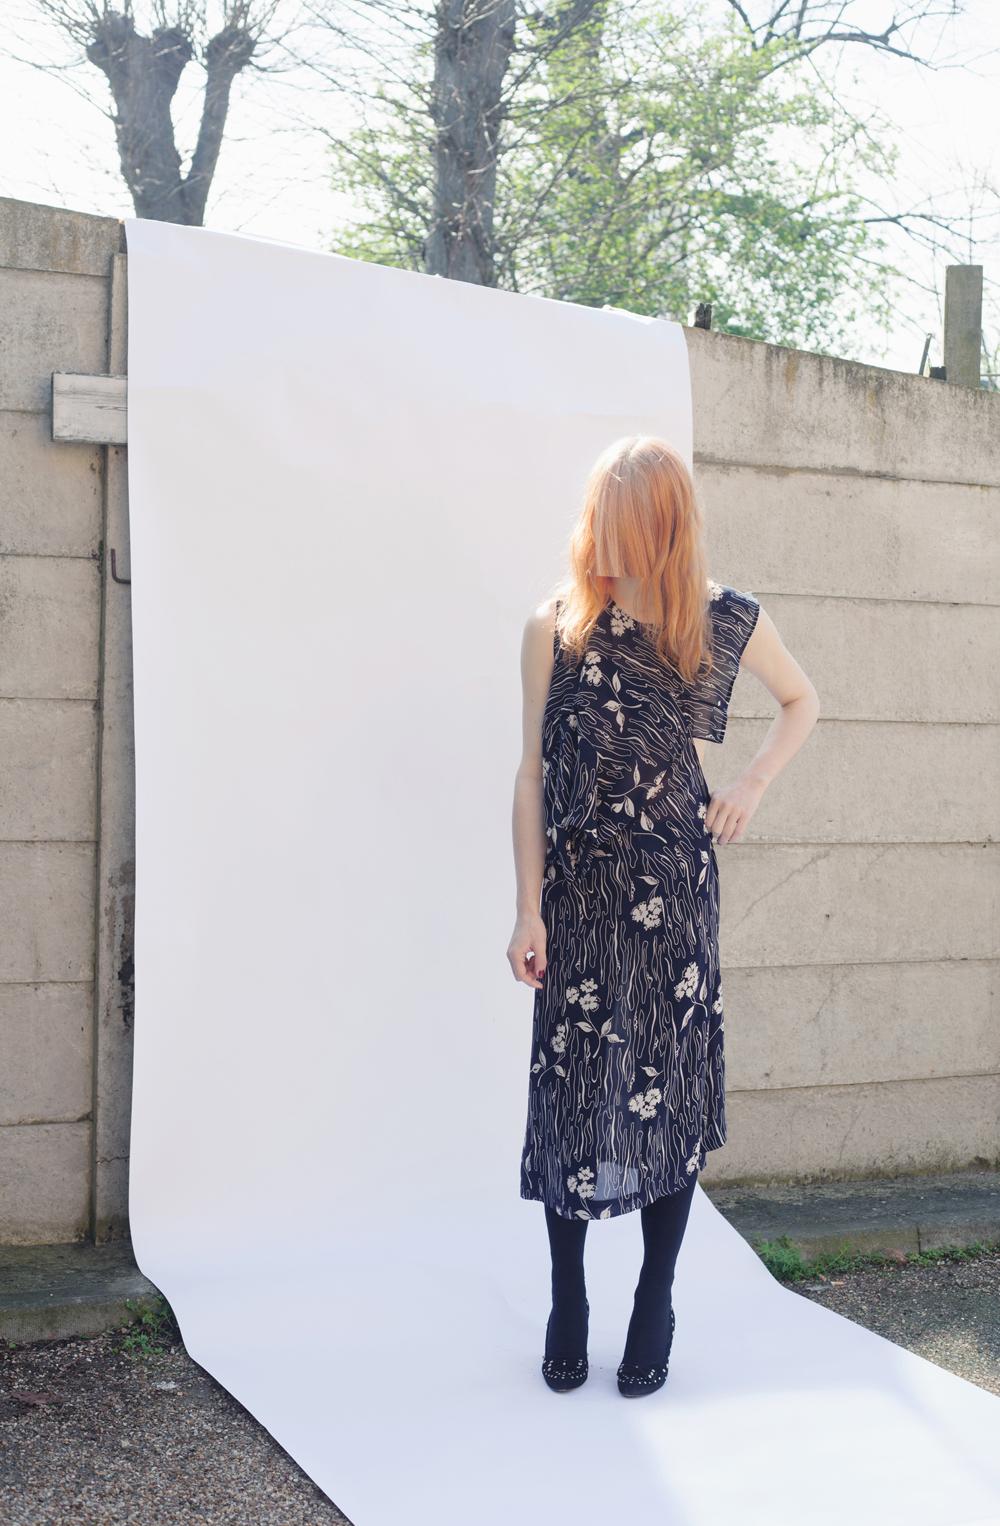 DRESS label Crisis Collection Look book Pixelated ARTISANAL RESCUE DRESS SERIES  Rescue Dress 01  – Navy & White Viscose Flower Print Dress-Ltd